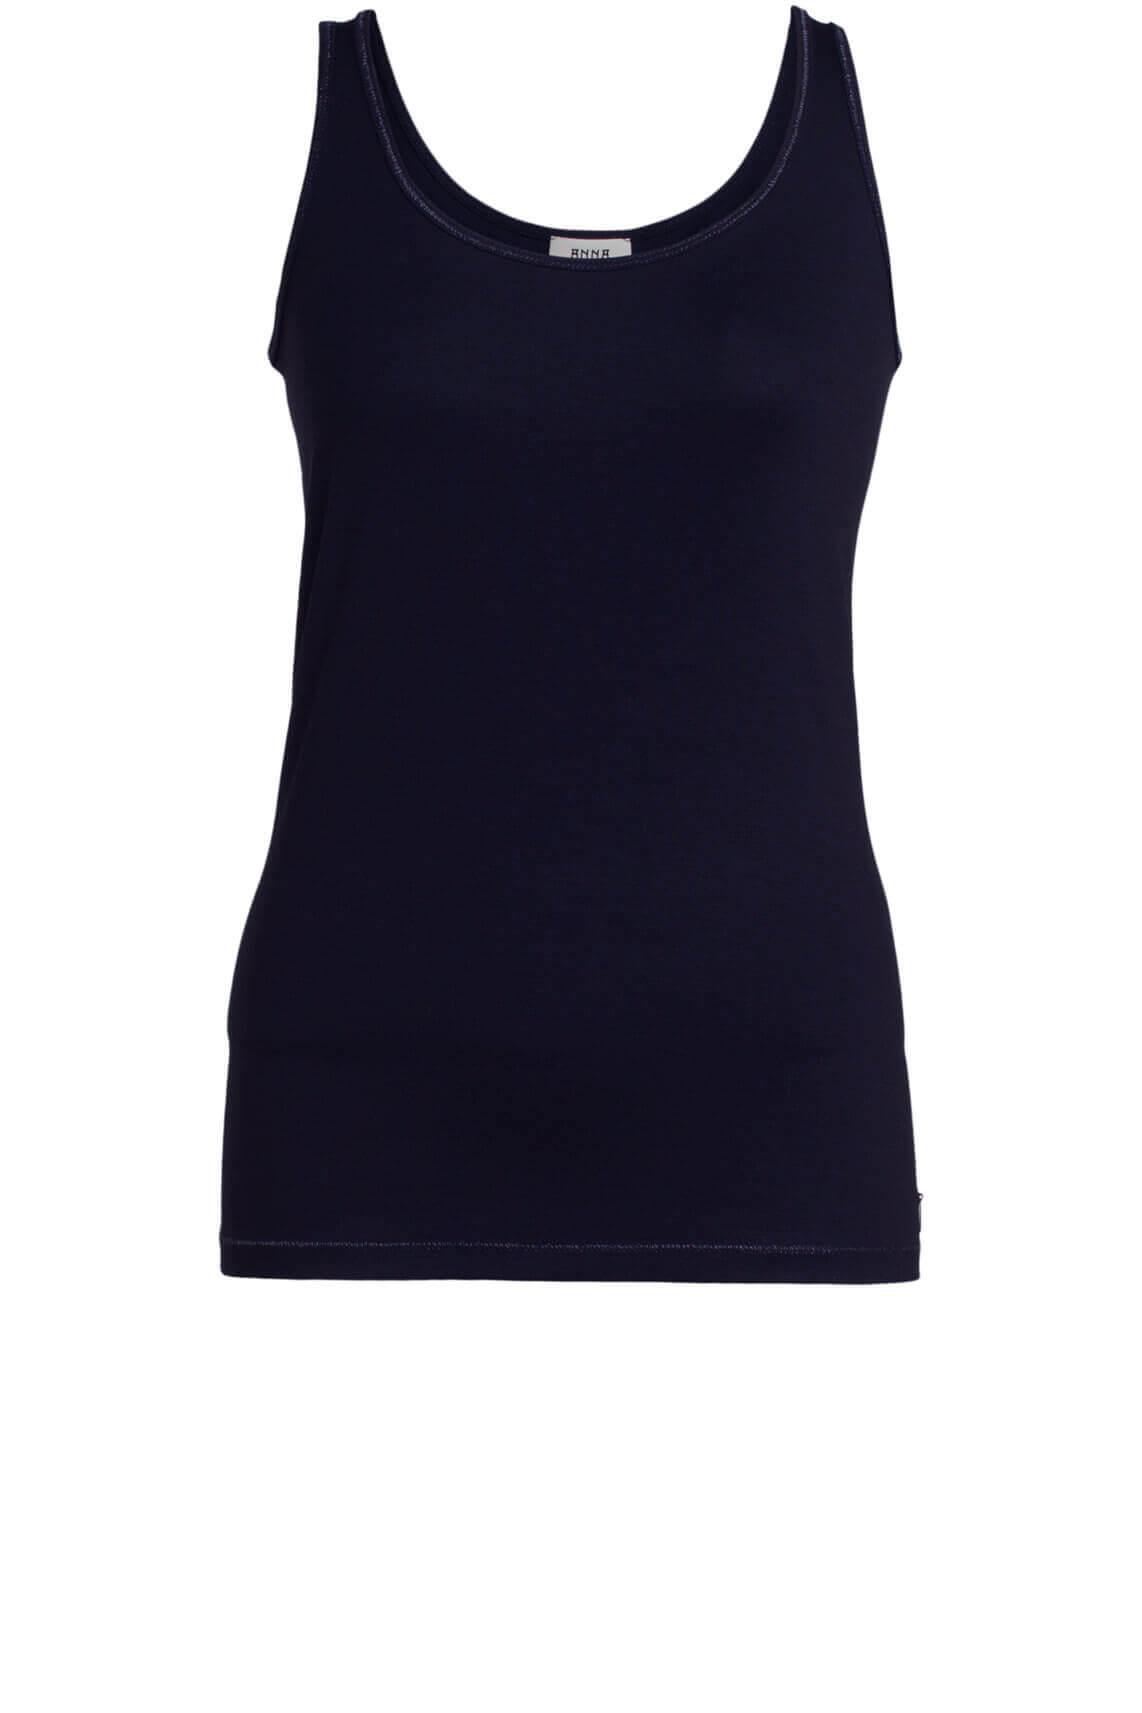 Anna Dames Top met lurex Blauw